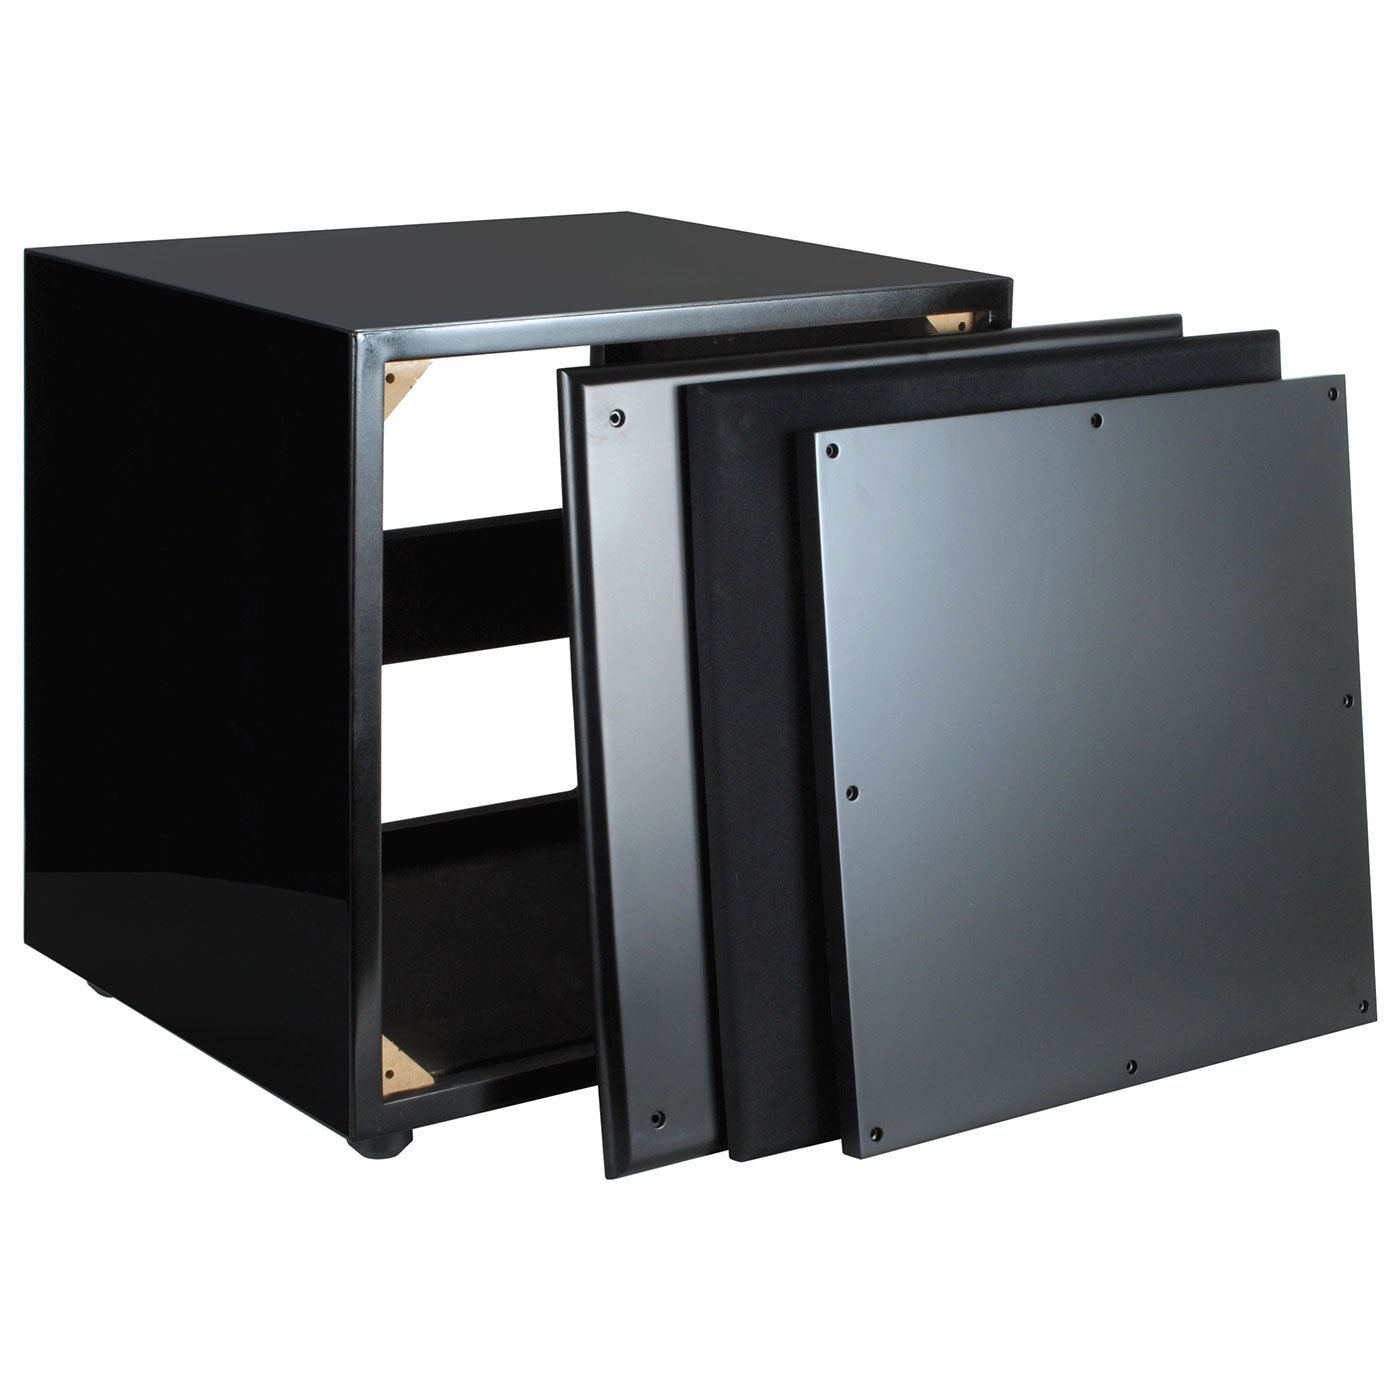 Dayton Audio SWC1-BK 1.0 ft³ Subwoofer Cabinet Gloss Black